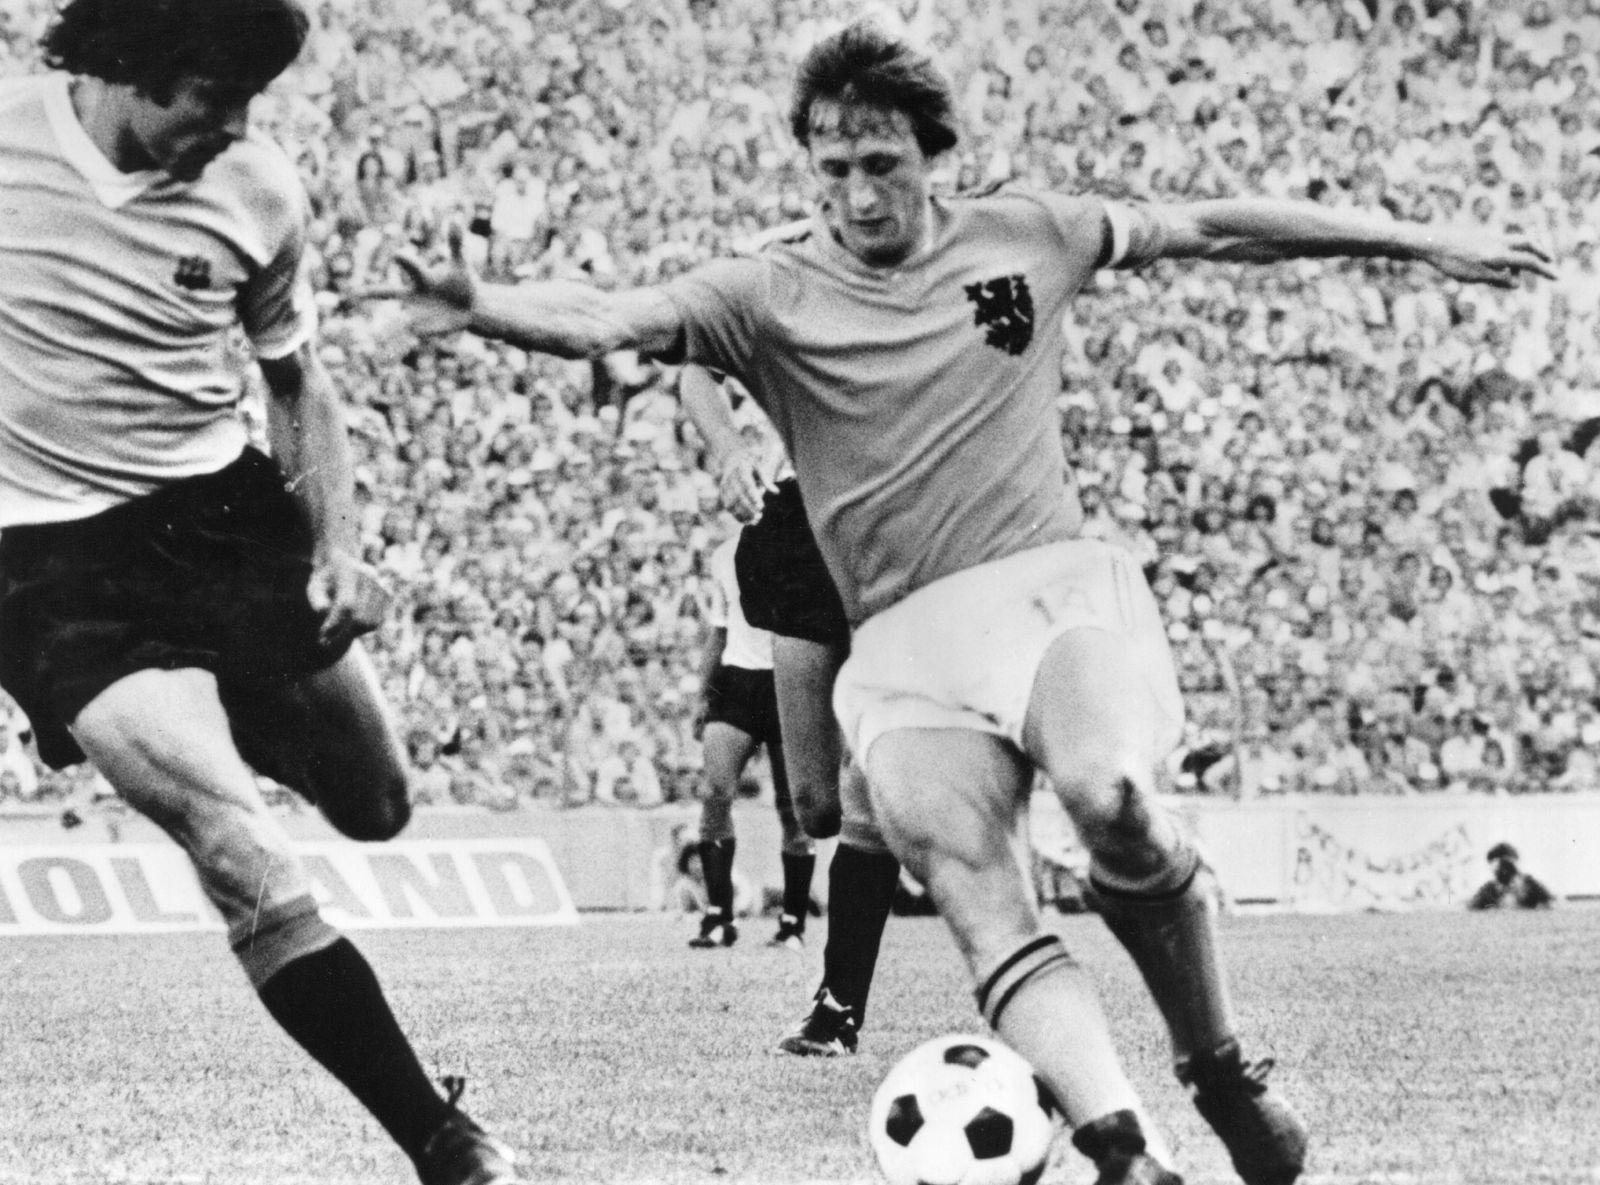 Johan Cruyff/ Uruguay 1974